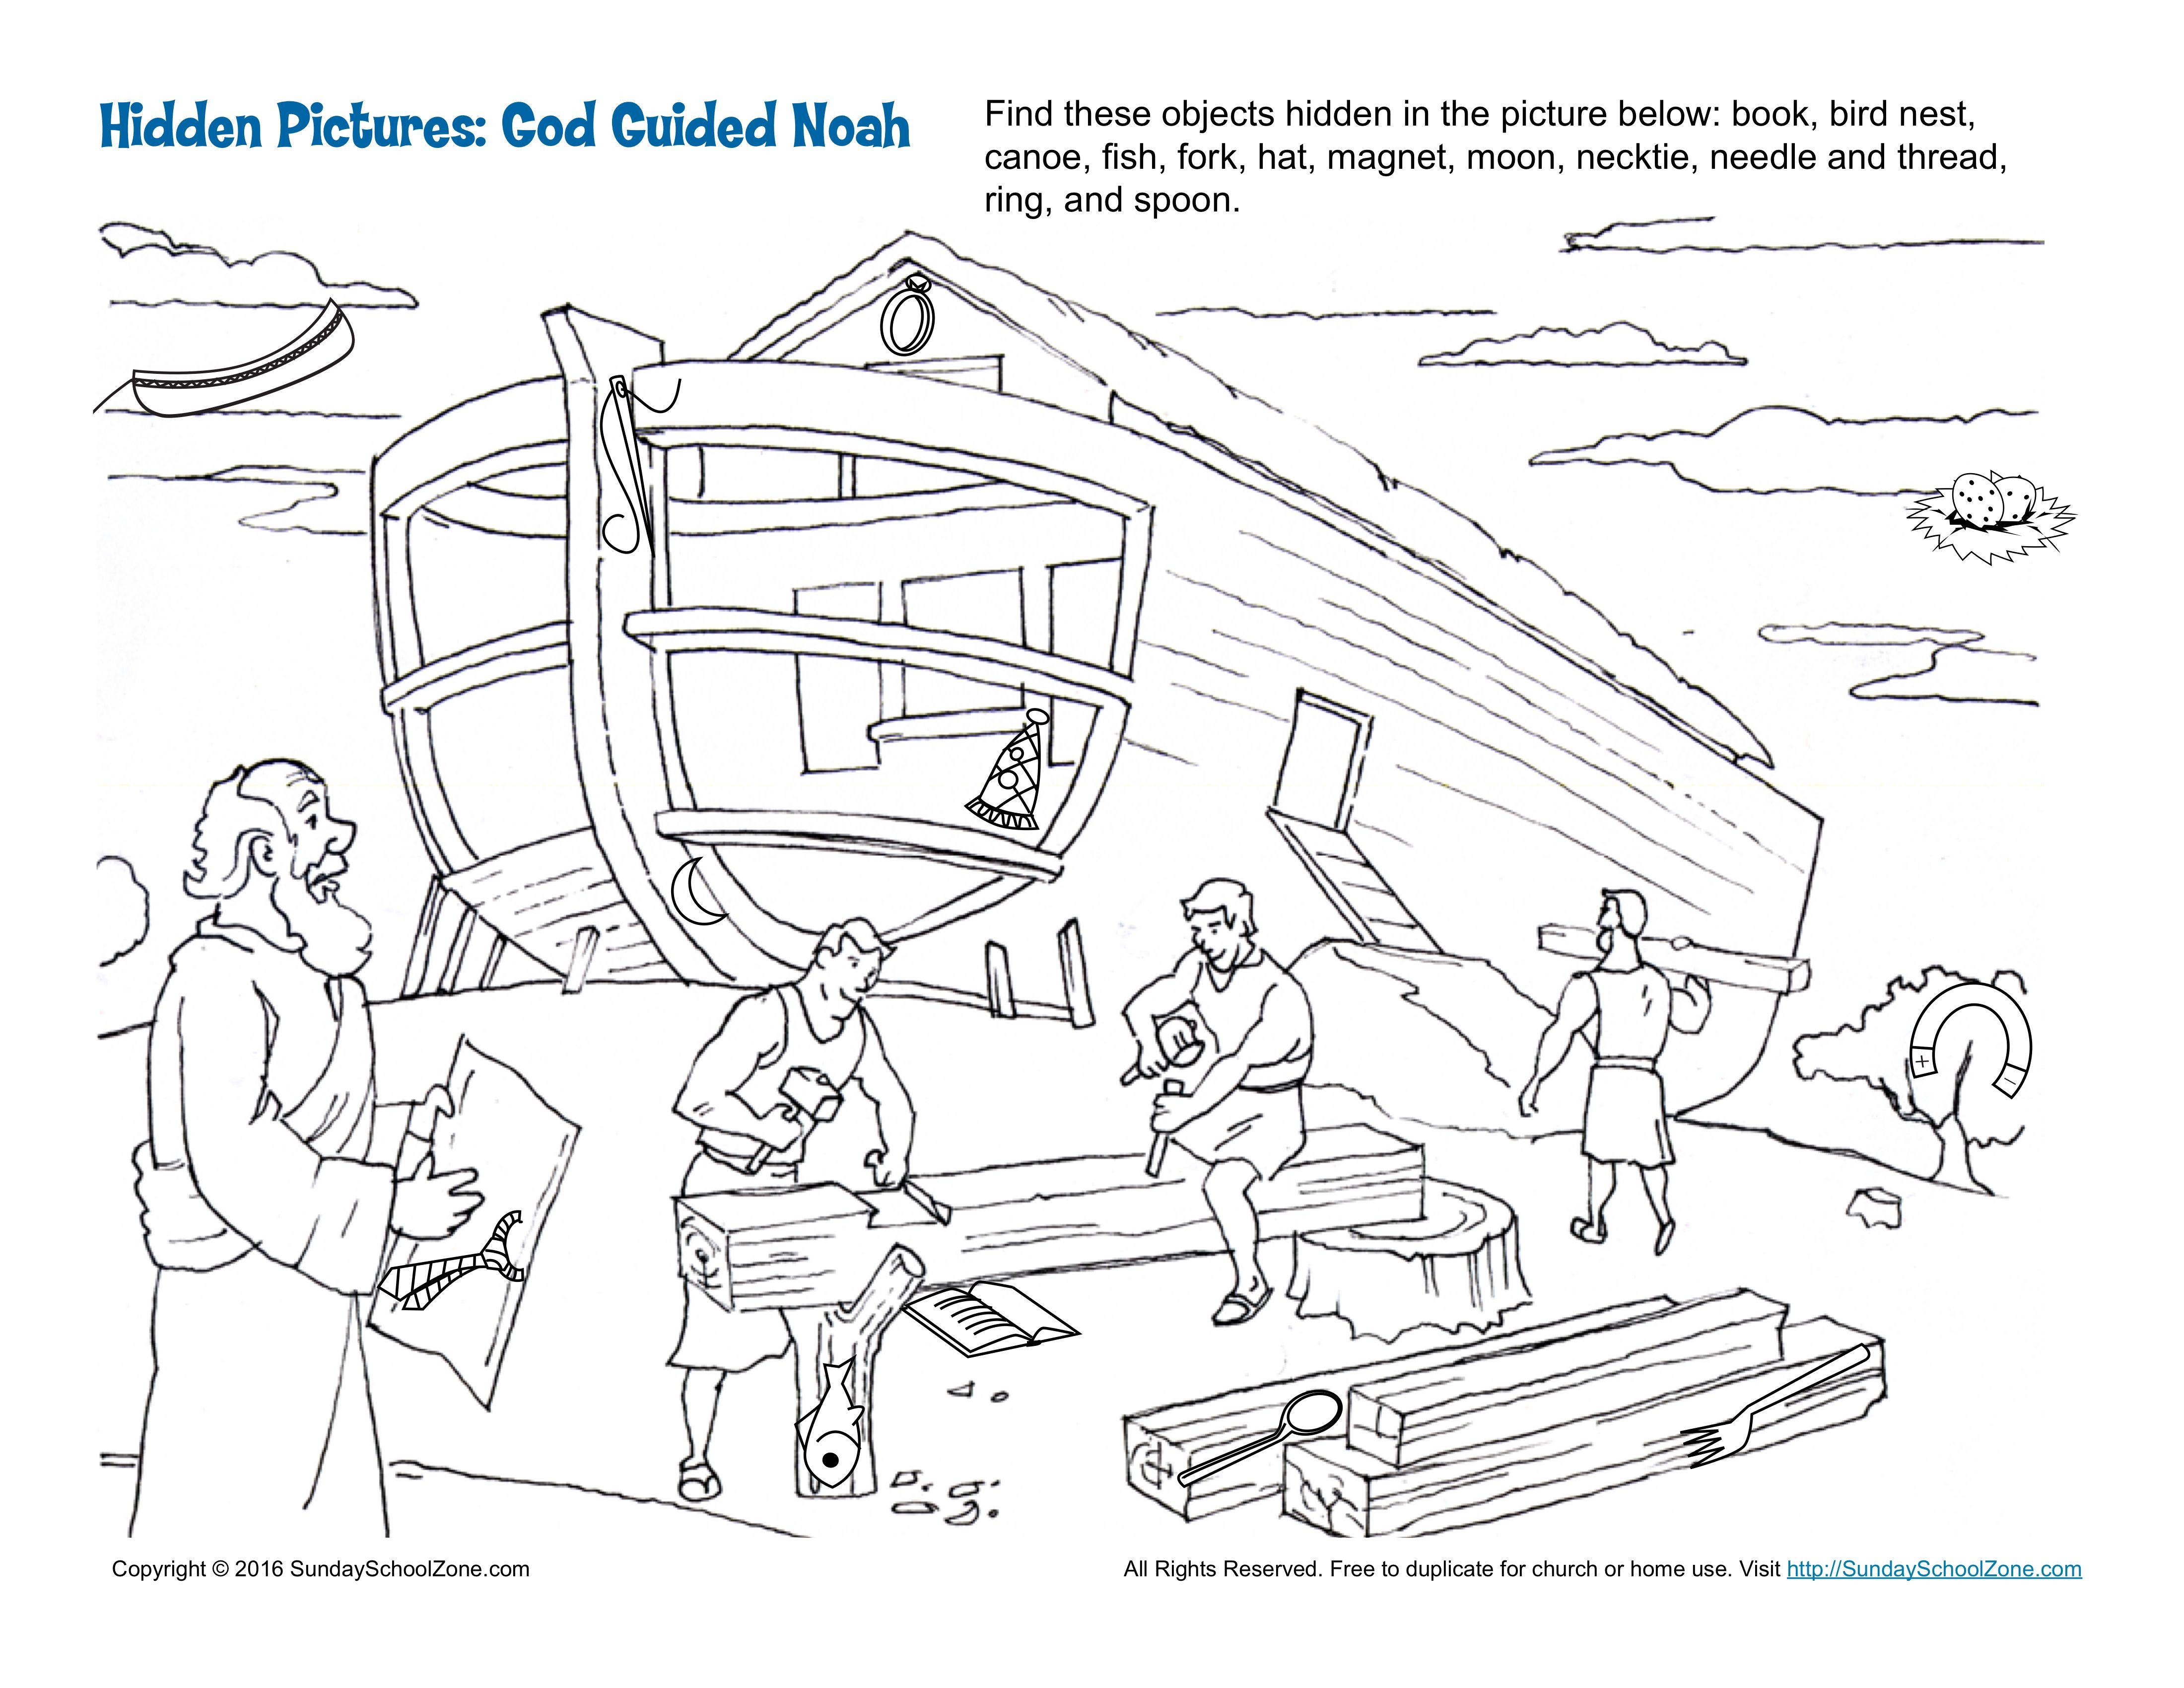 God Guided Noah Hidden Pictures